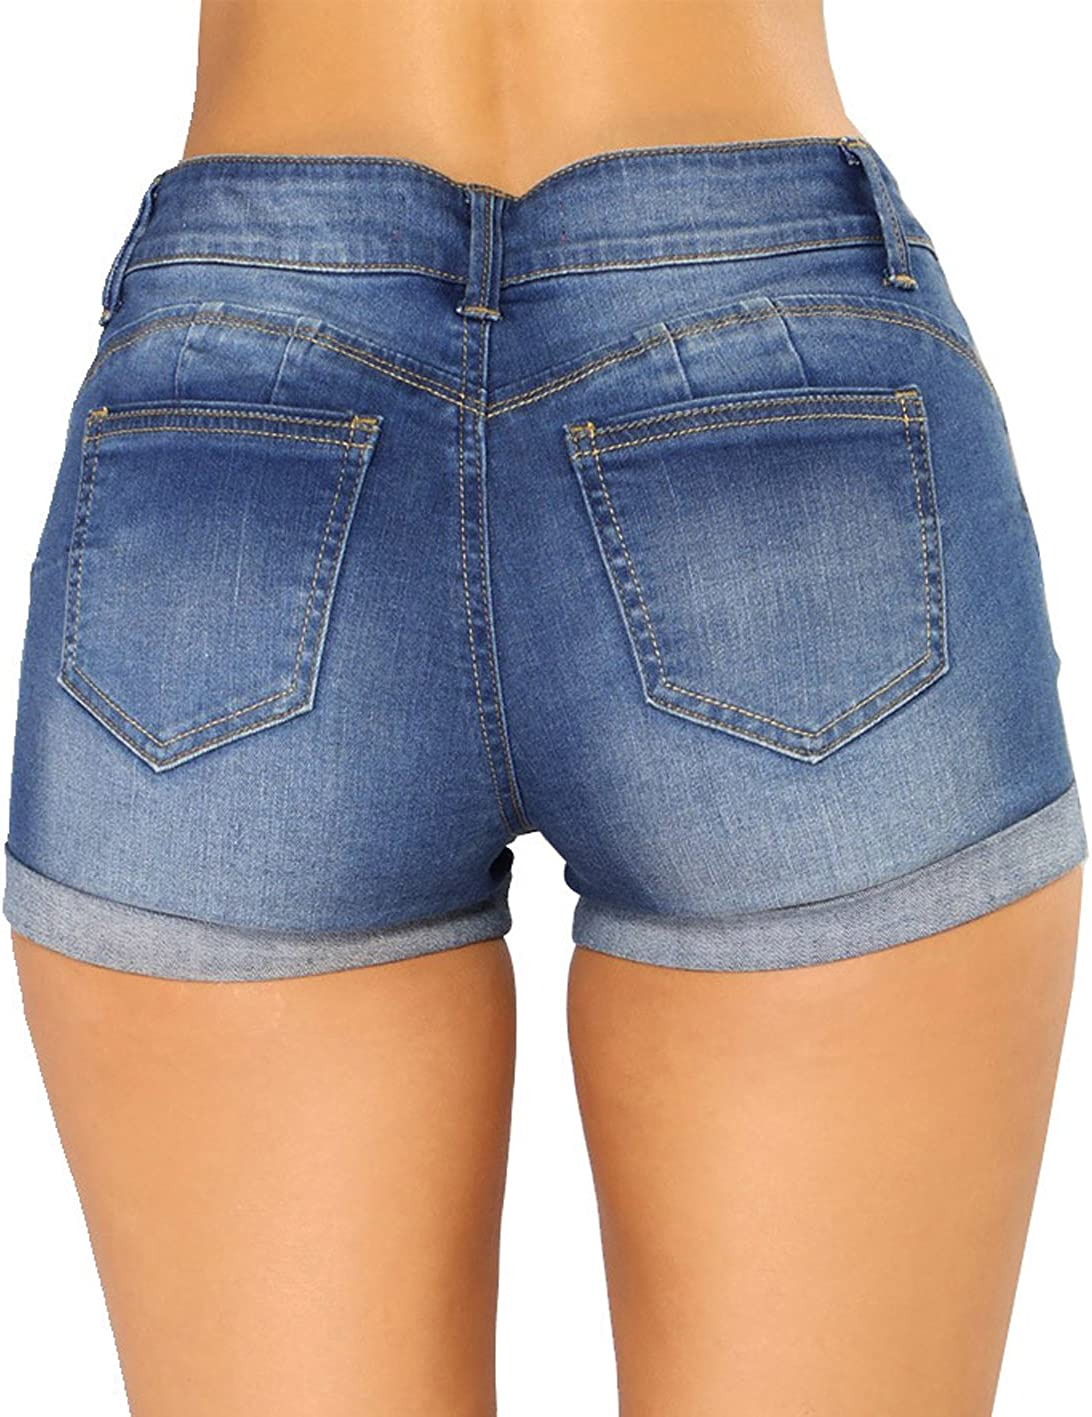 Govc Women Casual Summer Mid Waist Stretchy Denim Jean Shorts Junior Short Jeans